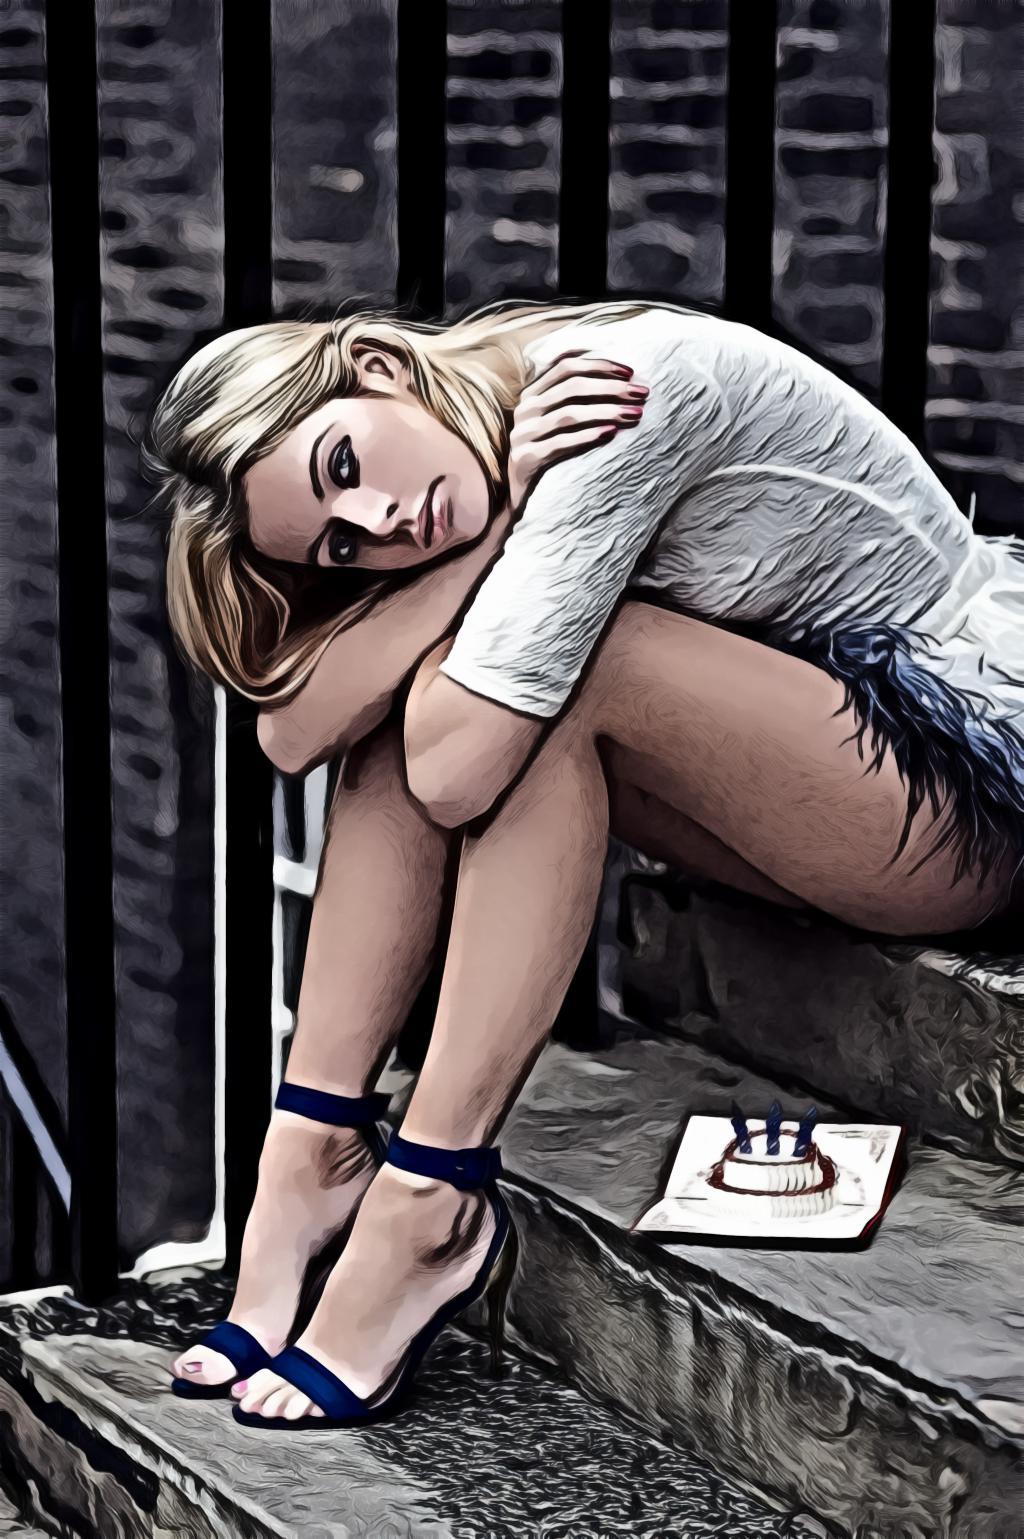 Woman wearing blue high heels